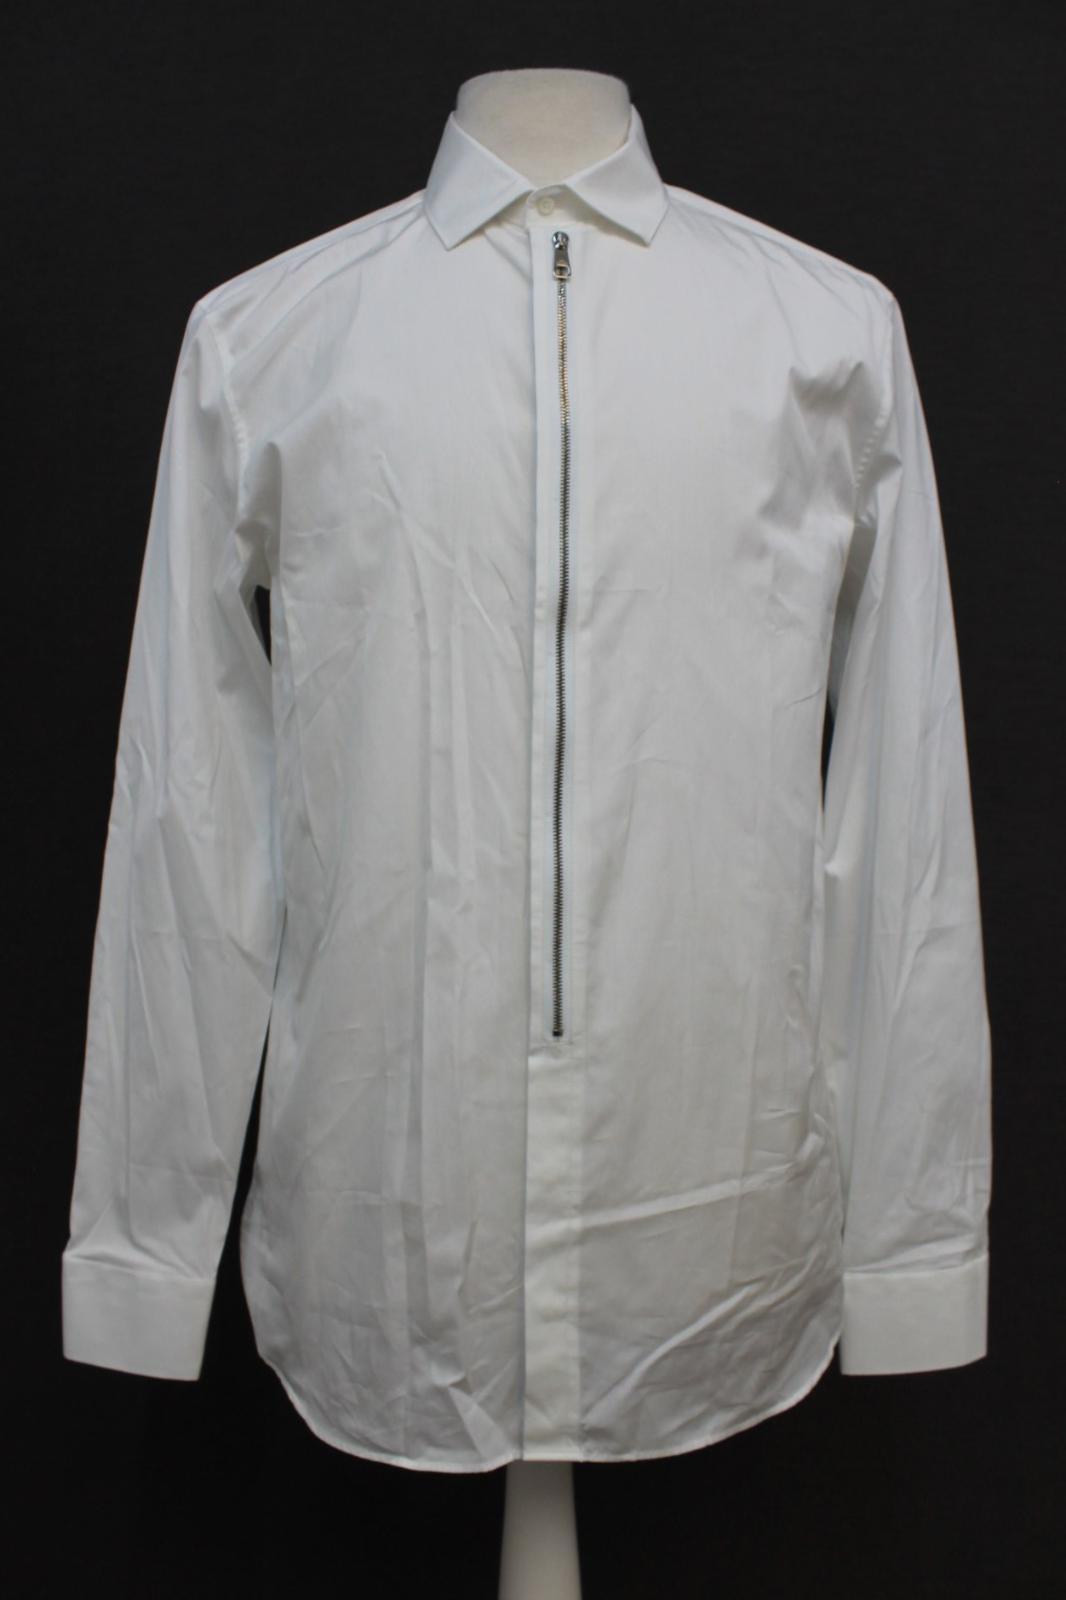 Neil-Barrett-para-hombre-calce-cenido-de-algodon-blanco-frontal-con-cremallera-con-cuello-camisa miniatura 2